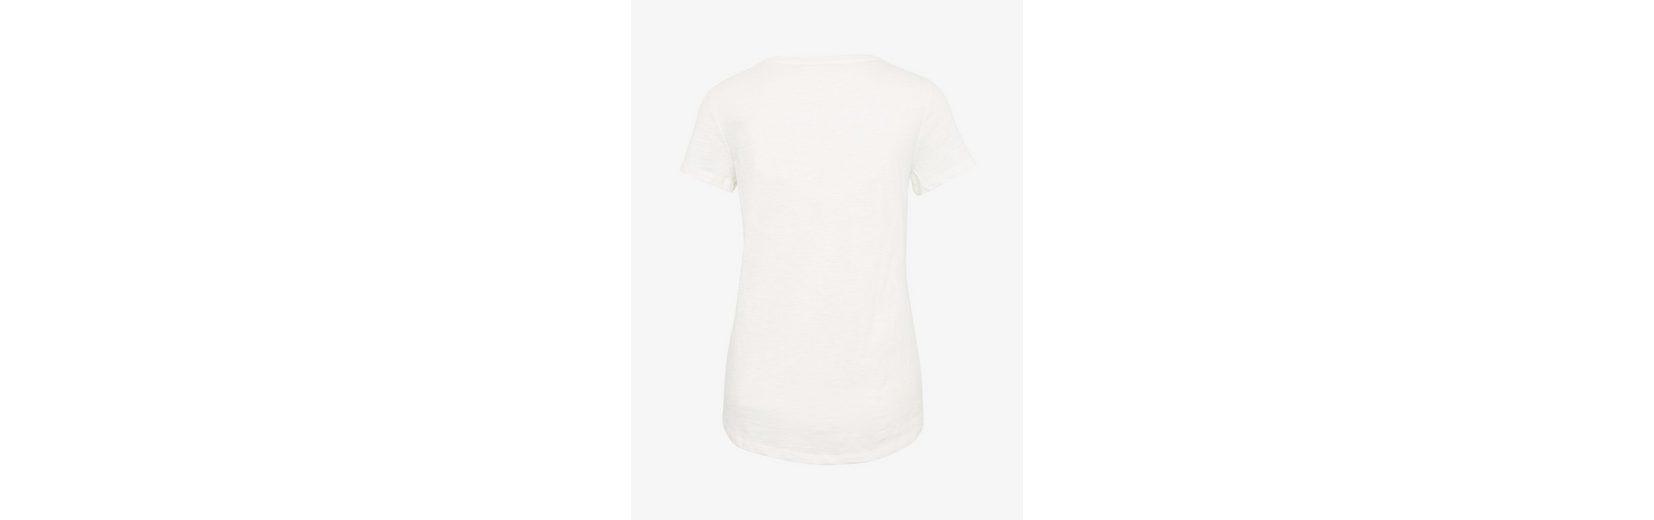 Denim Schrift Print T Tailor T Shirt Tom Shirt mit pT54xq0